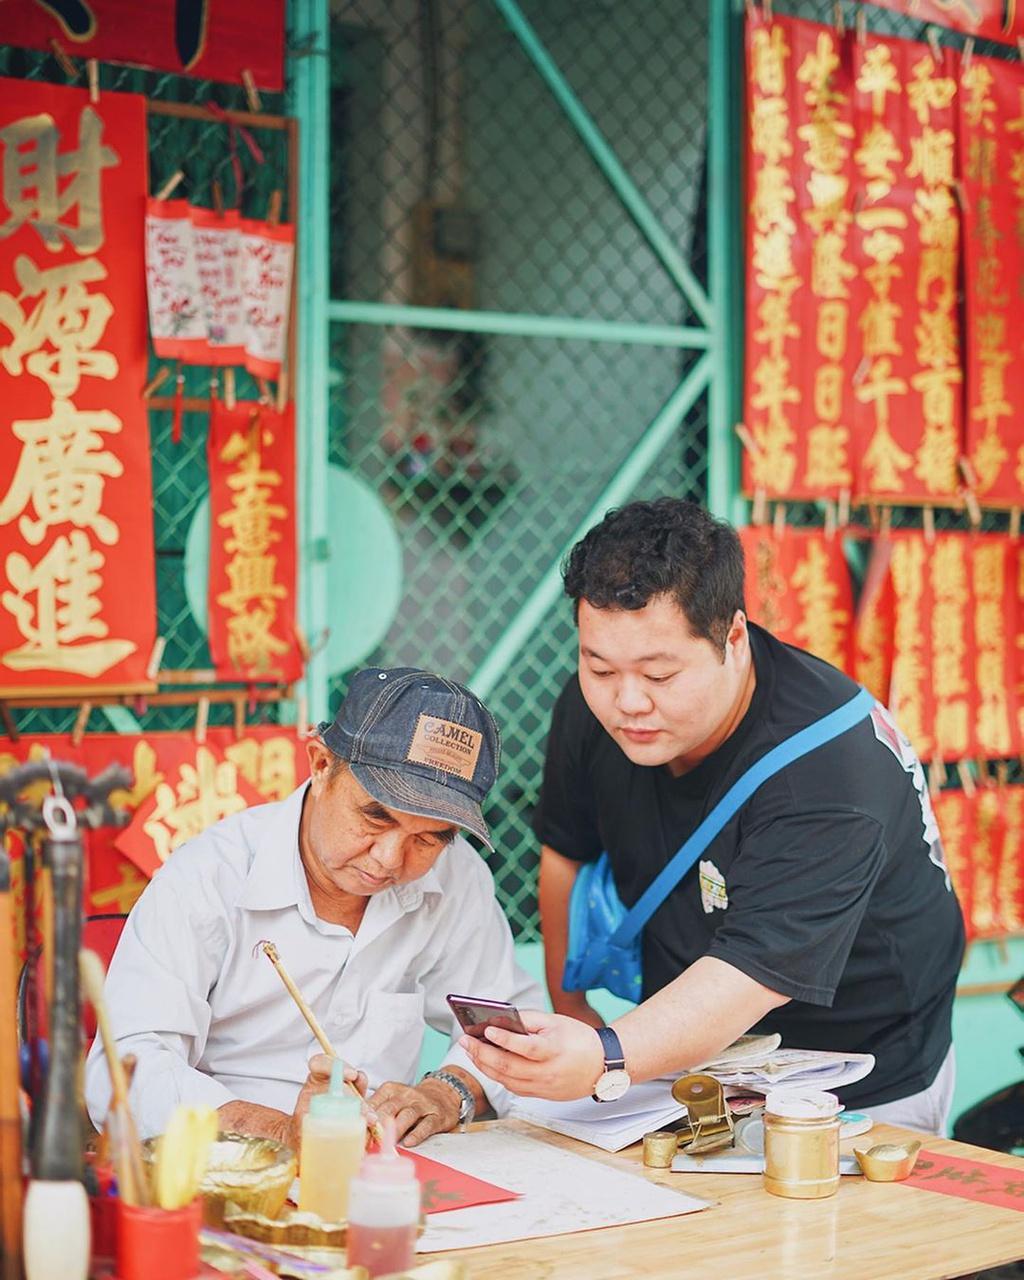 du-lich-chau-a-khong-can-visa-ngay-tai-tphcm-ivivu-6